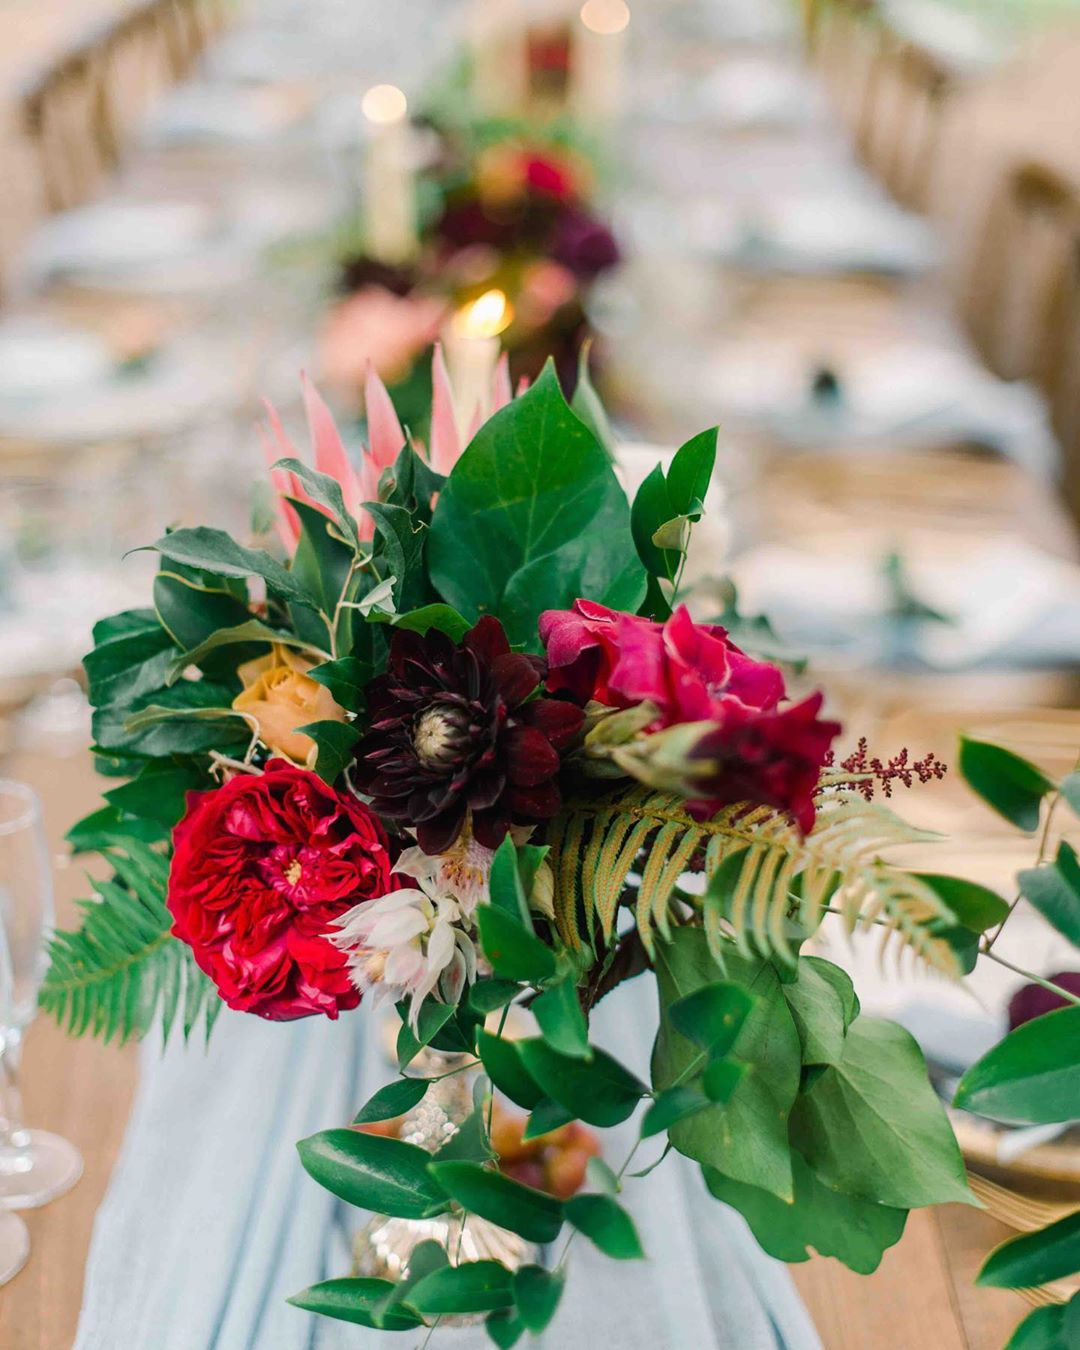 {table•pretty} photo | @jennidarling  planning | @nhwedplanner . . #tabledecor #centerpiece #flowers #prettyflowers #wedding #weddingday #breakingbread #family #friends #ido #nhwedding #lotusfloraldesigns #love